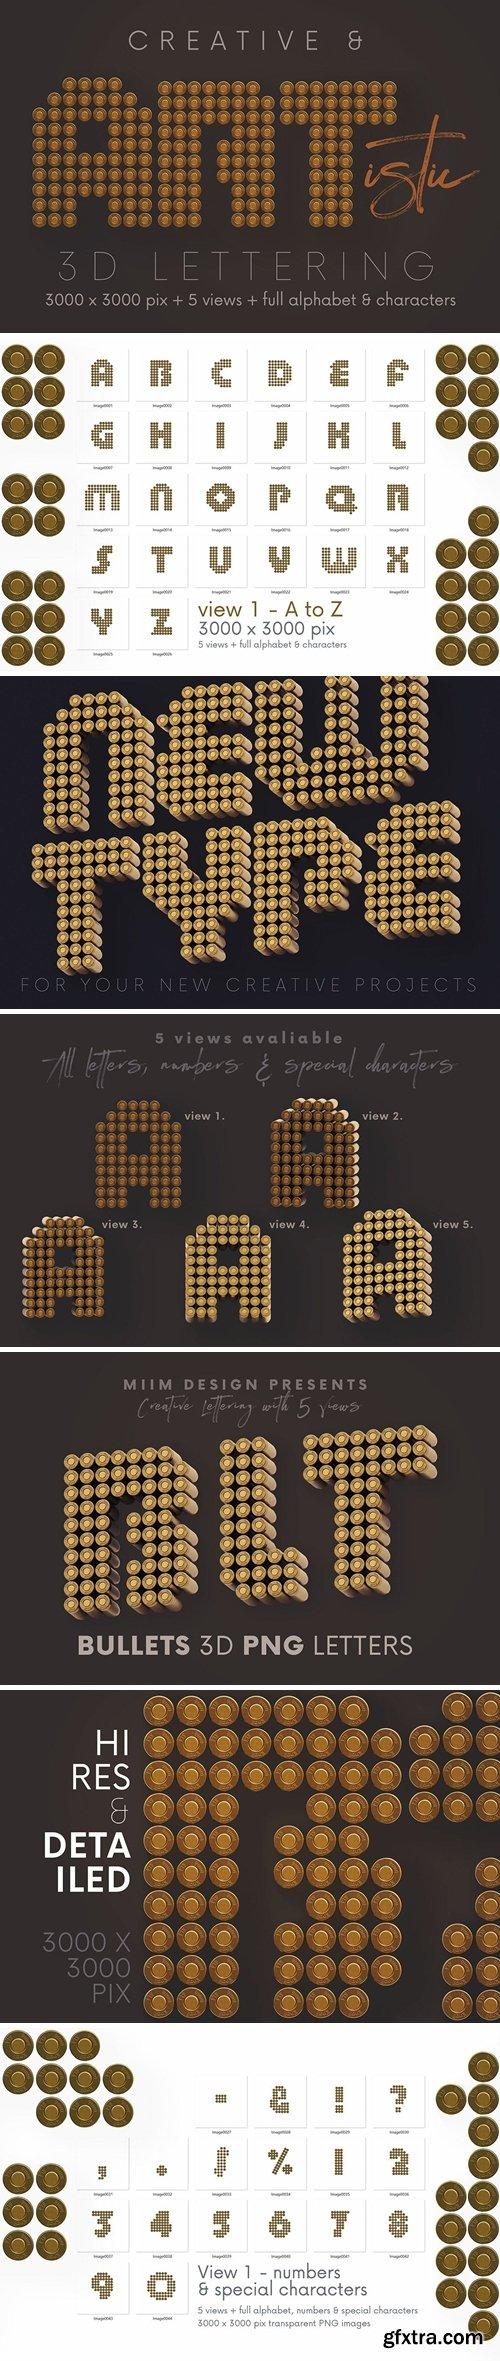 Bullets - 3D Lettering